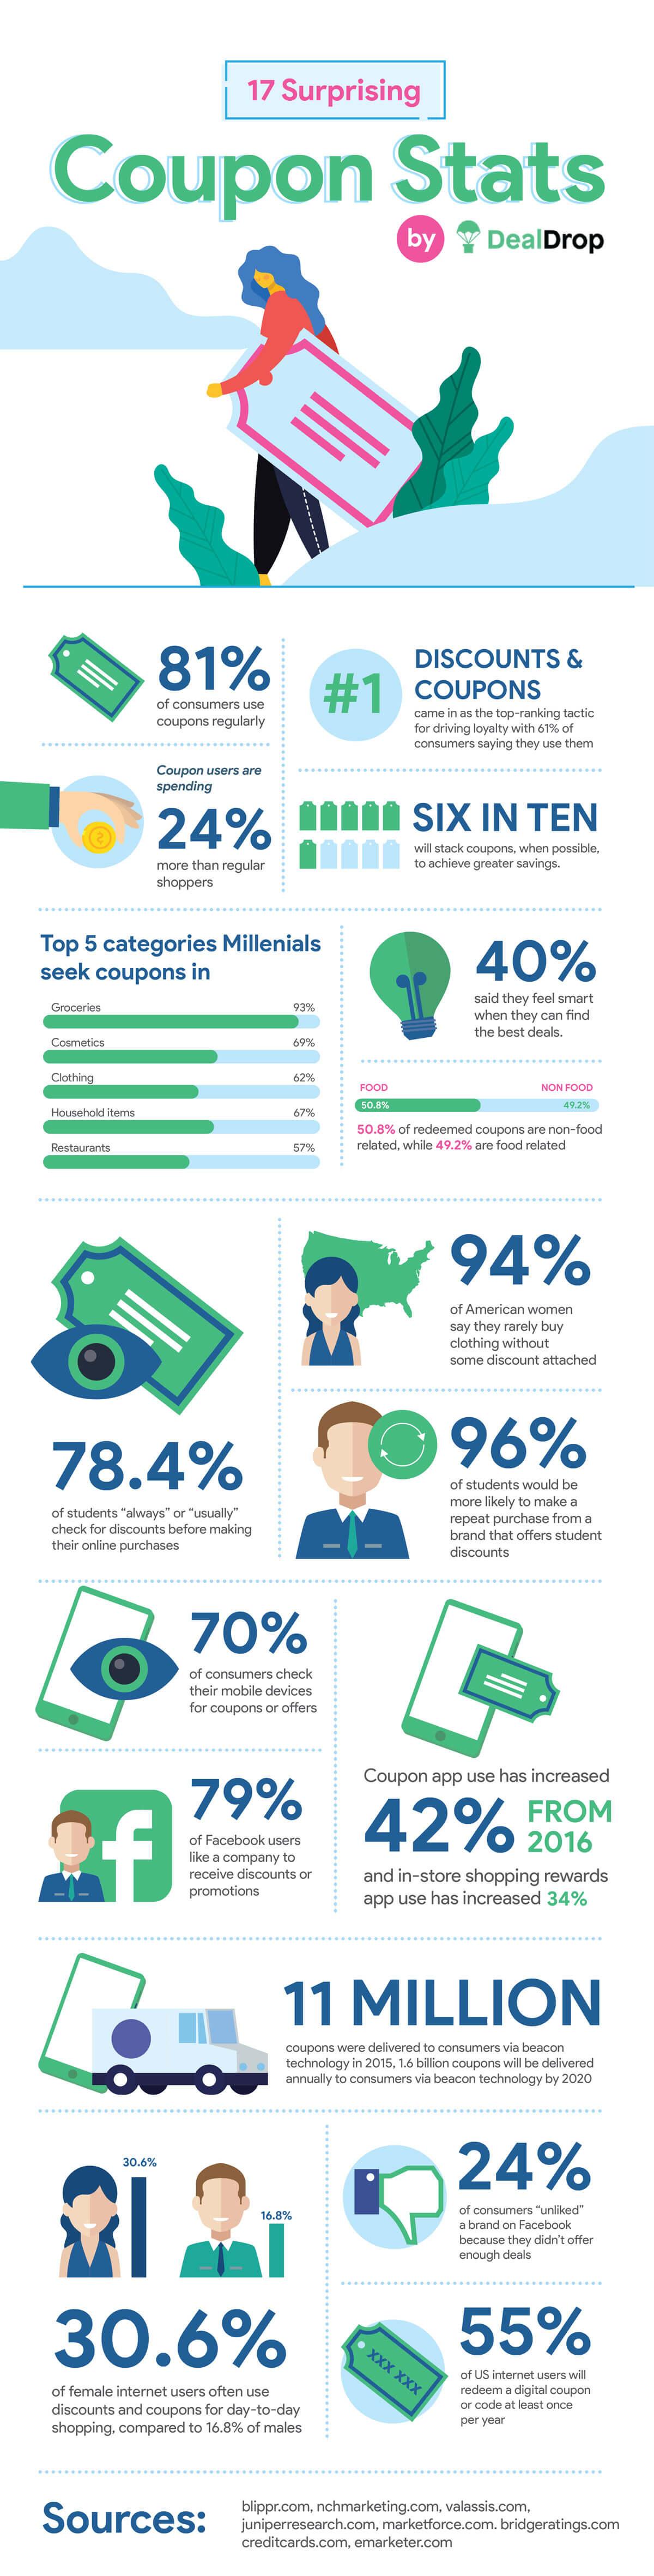 infographic-coupon-statistics-trends-dealdrop